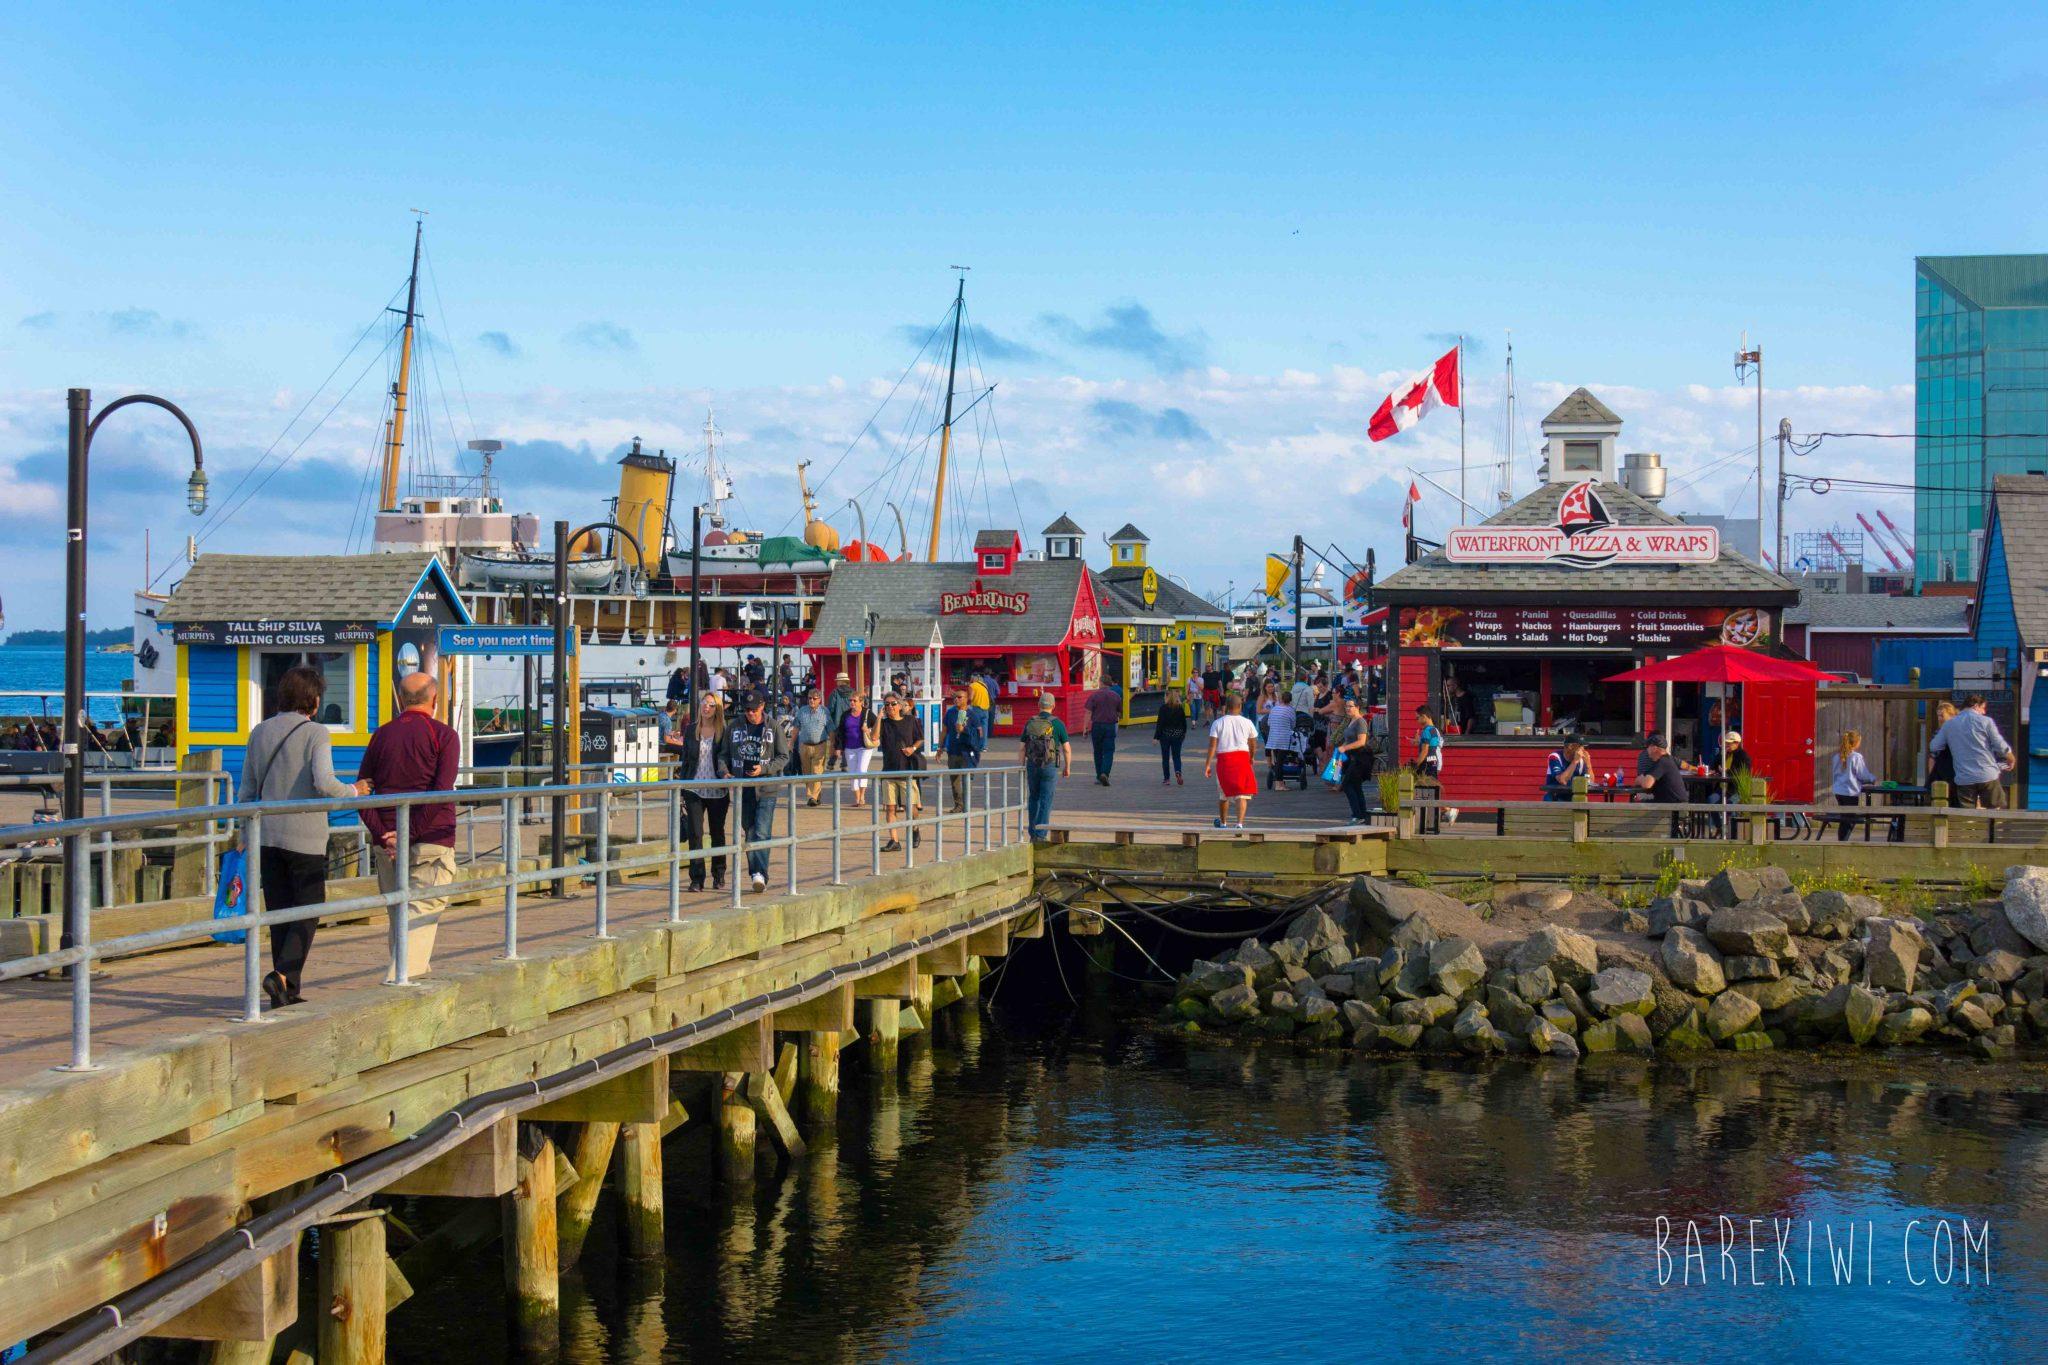 Halifax (1 of 1)